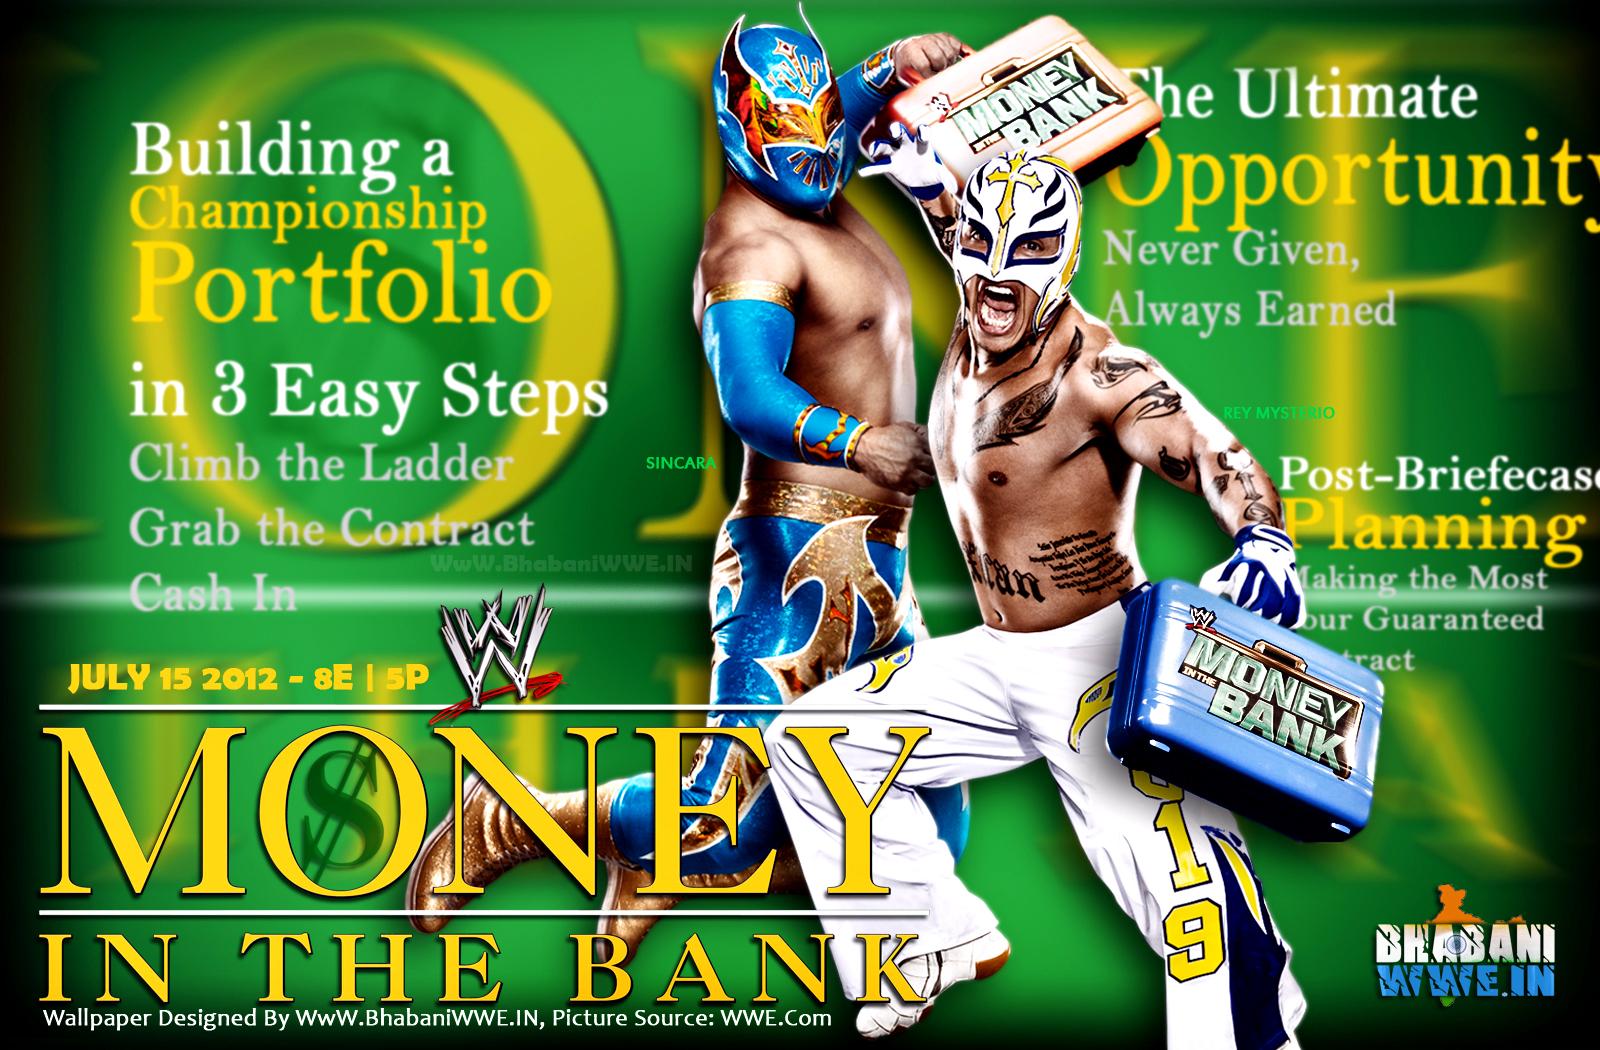 http://3.bp.blogspot.com/-rppFhQiNaT8/T-d-Rz7udlI/AAAAAAAAKyk/O6bfI6SXOB4/s1600/wwe_money_in_the_bank_2012_wallpaper_by_bhabaniwwe_feat_rey_mysterio_and_sincara_hq_free.jpg